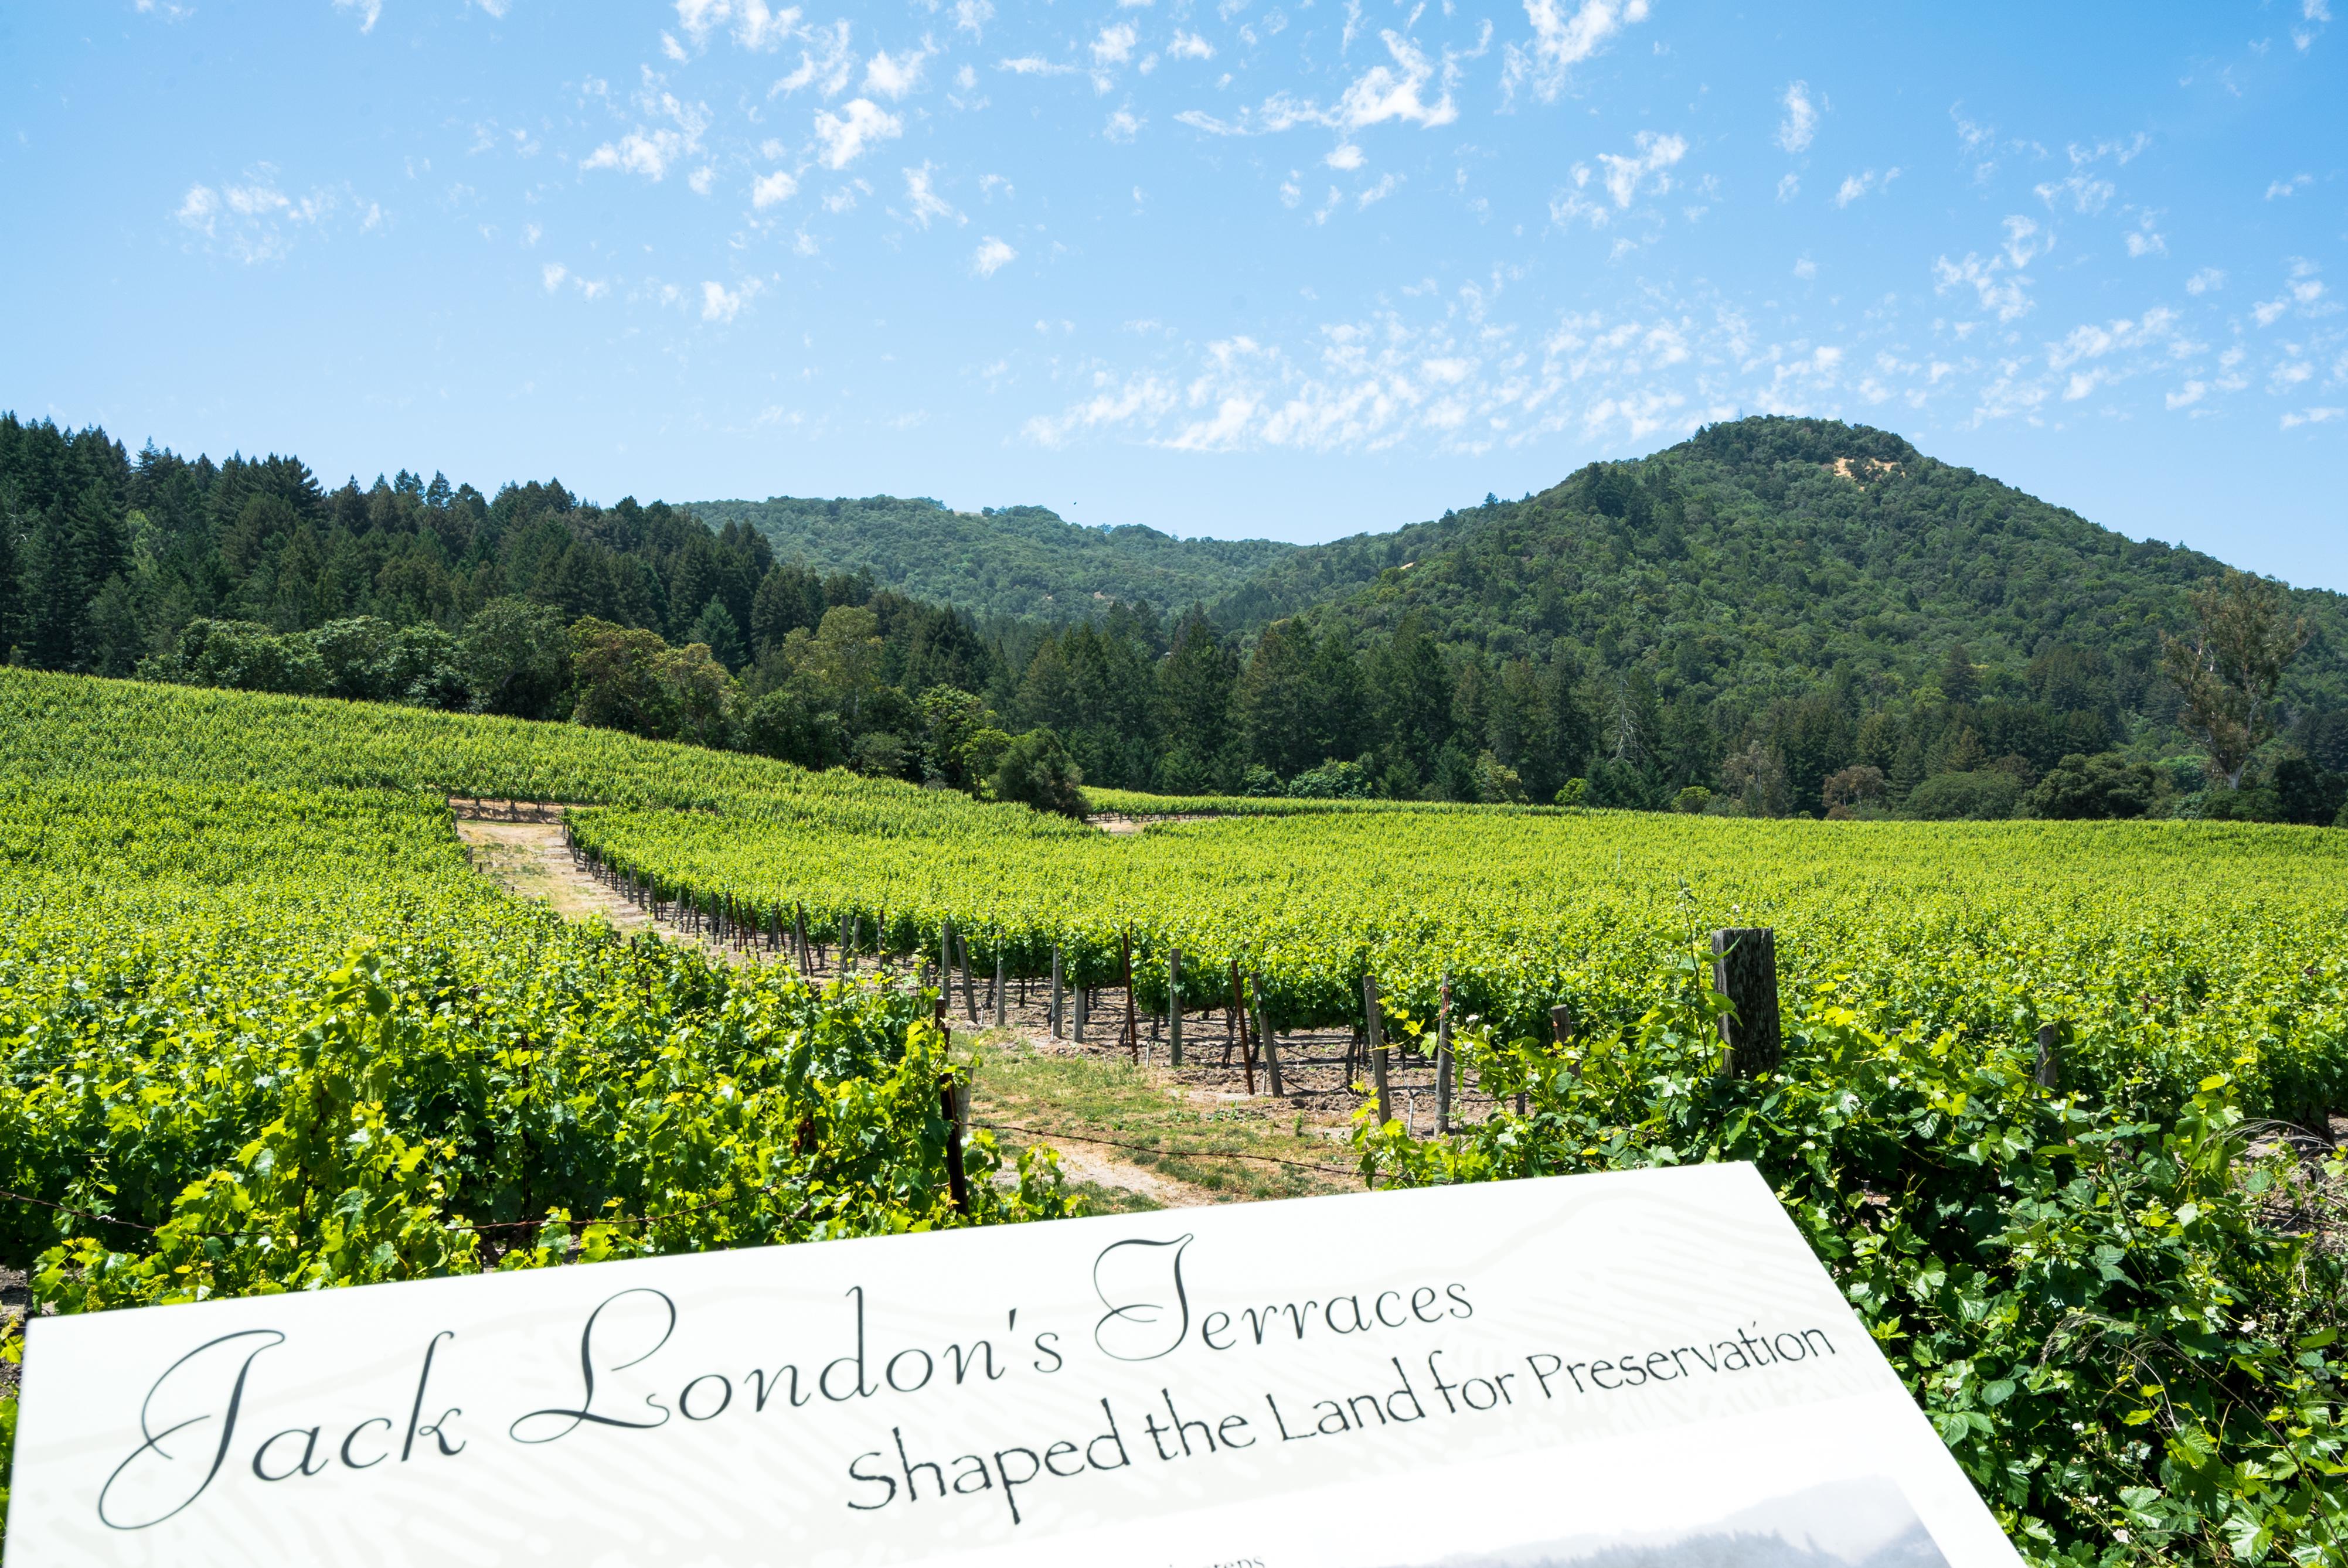 Go hiking amongst vineyards and redwoods at Jack London State Historic Park in Glen Ellen, Sonoma County, California